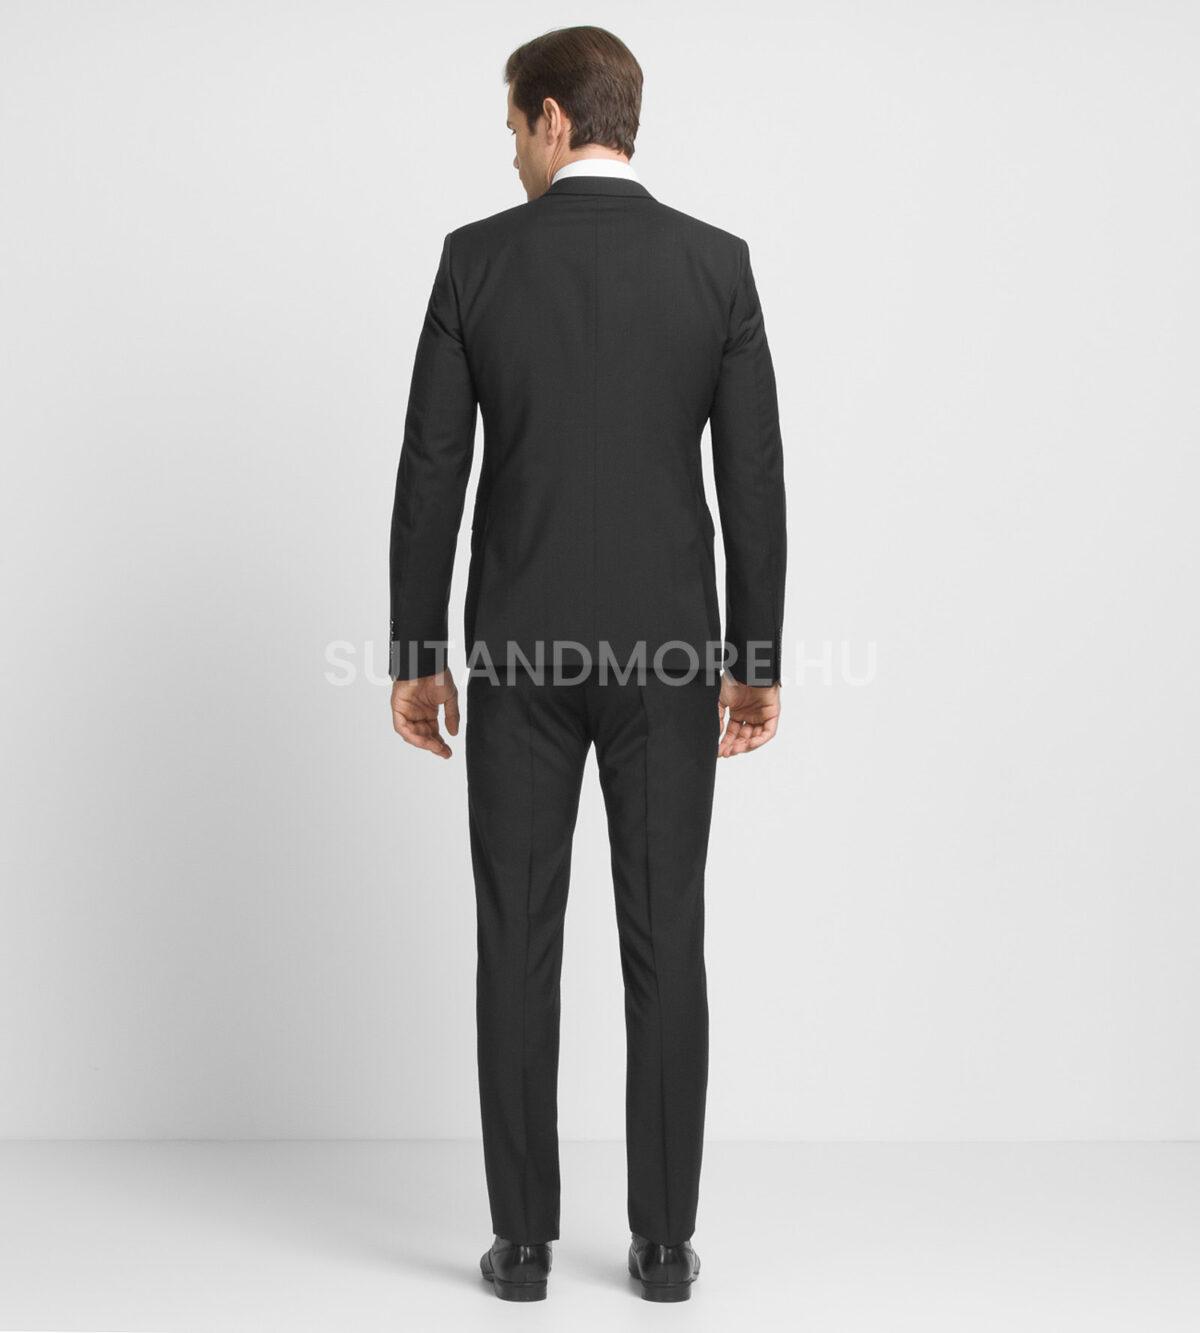 move-extra-slim-fit-fekete-oltony-nick-noah-99832-10-04 1